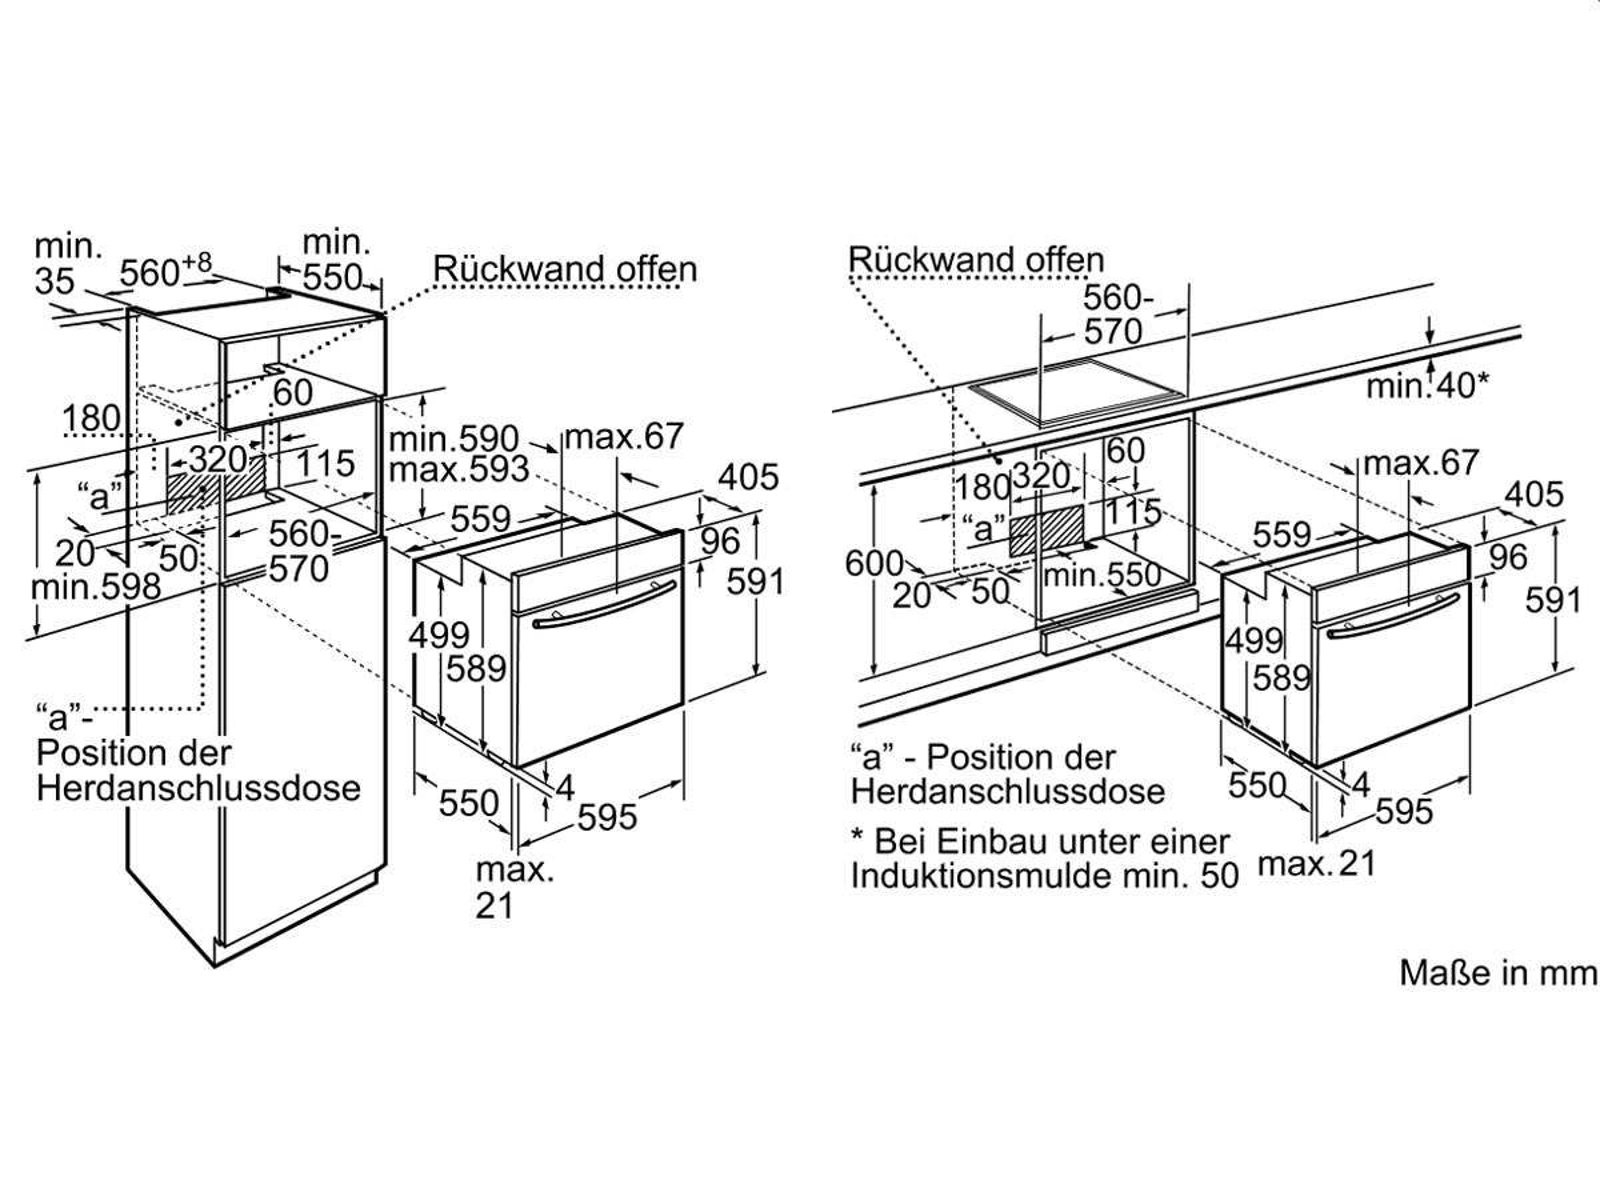 neff backofenset b45m42n5 t46bt60n0 induktionskochfeld autark ofen herd k che ebay. Black Bedroom Furniture Sets. Home Design Ideas